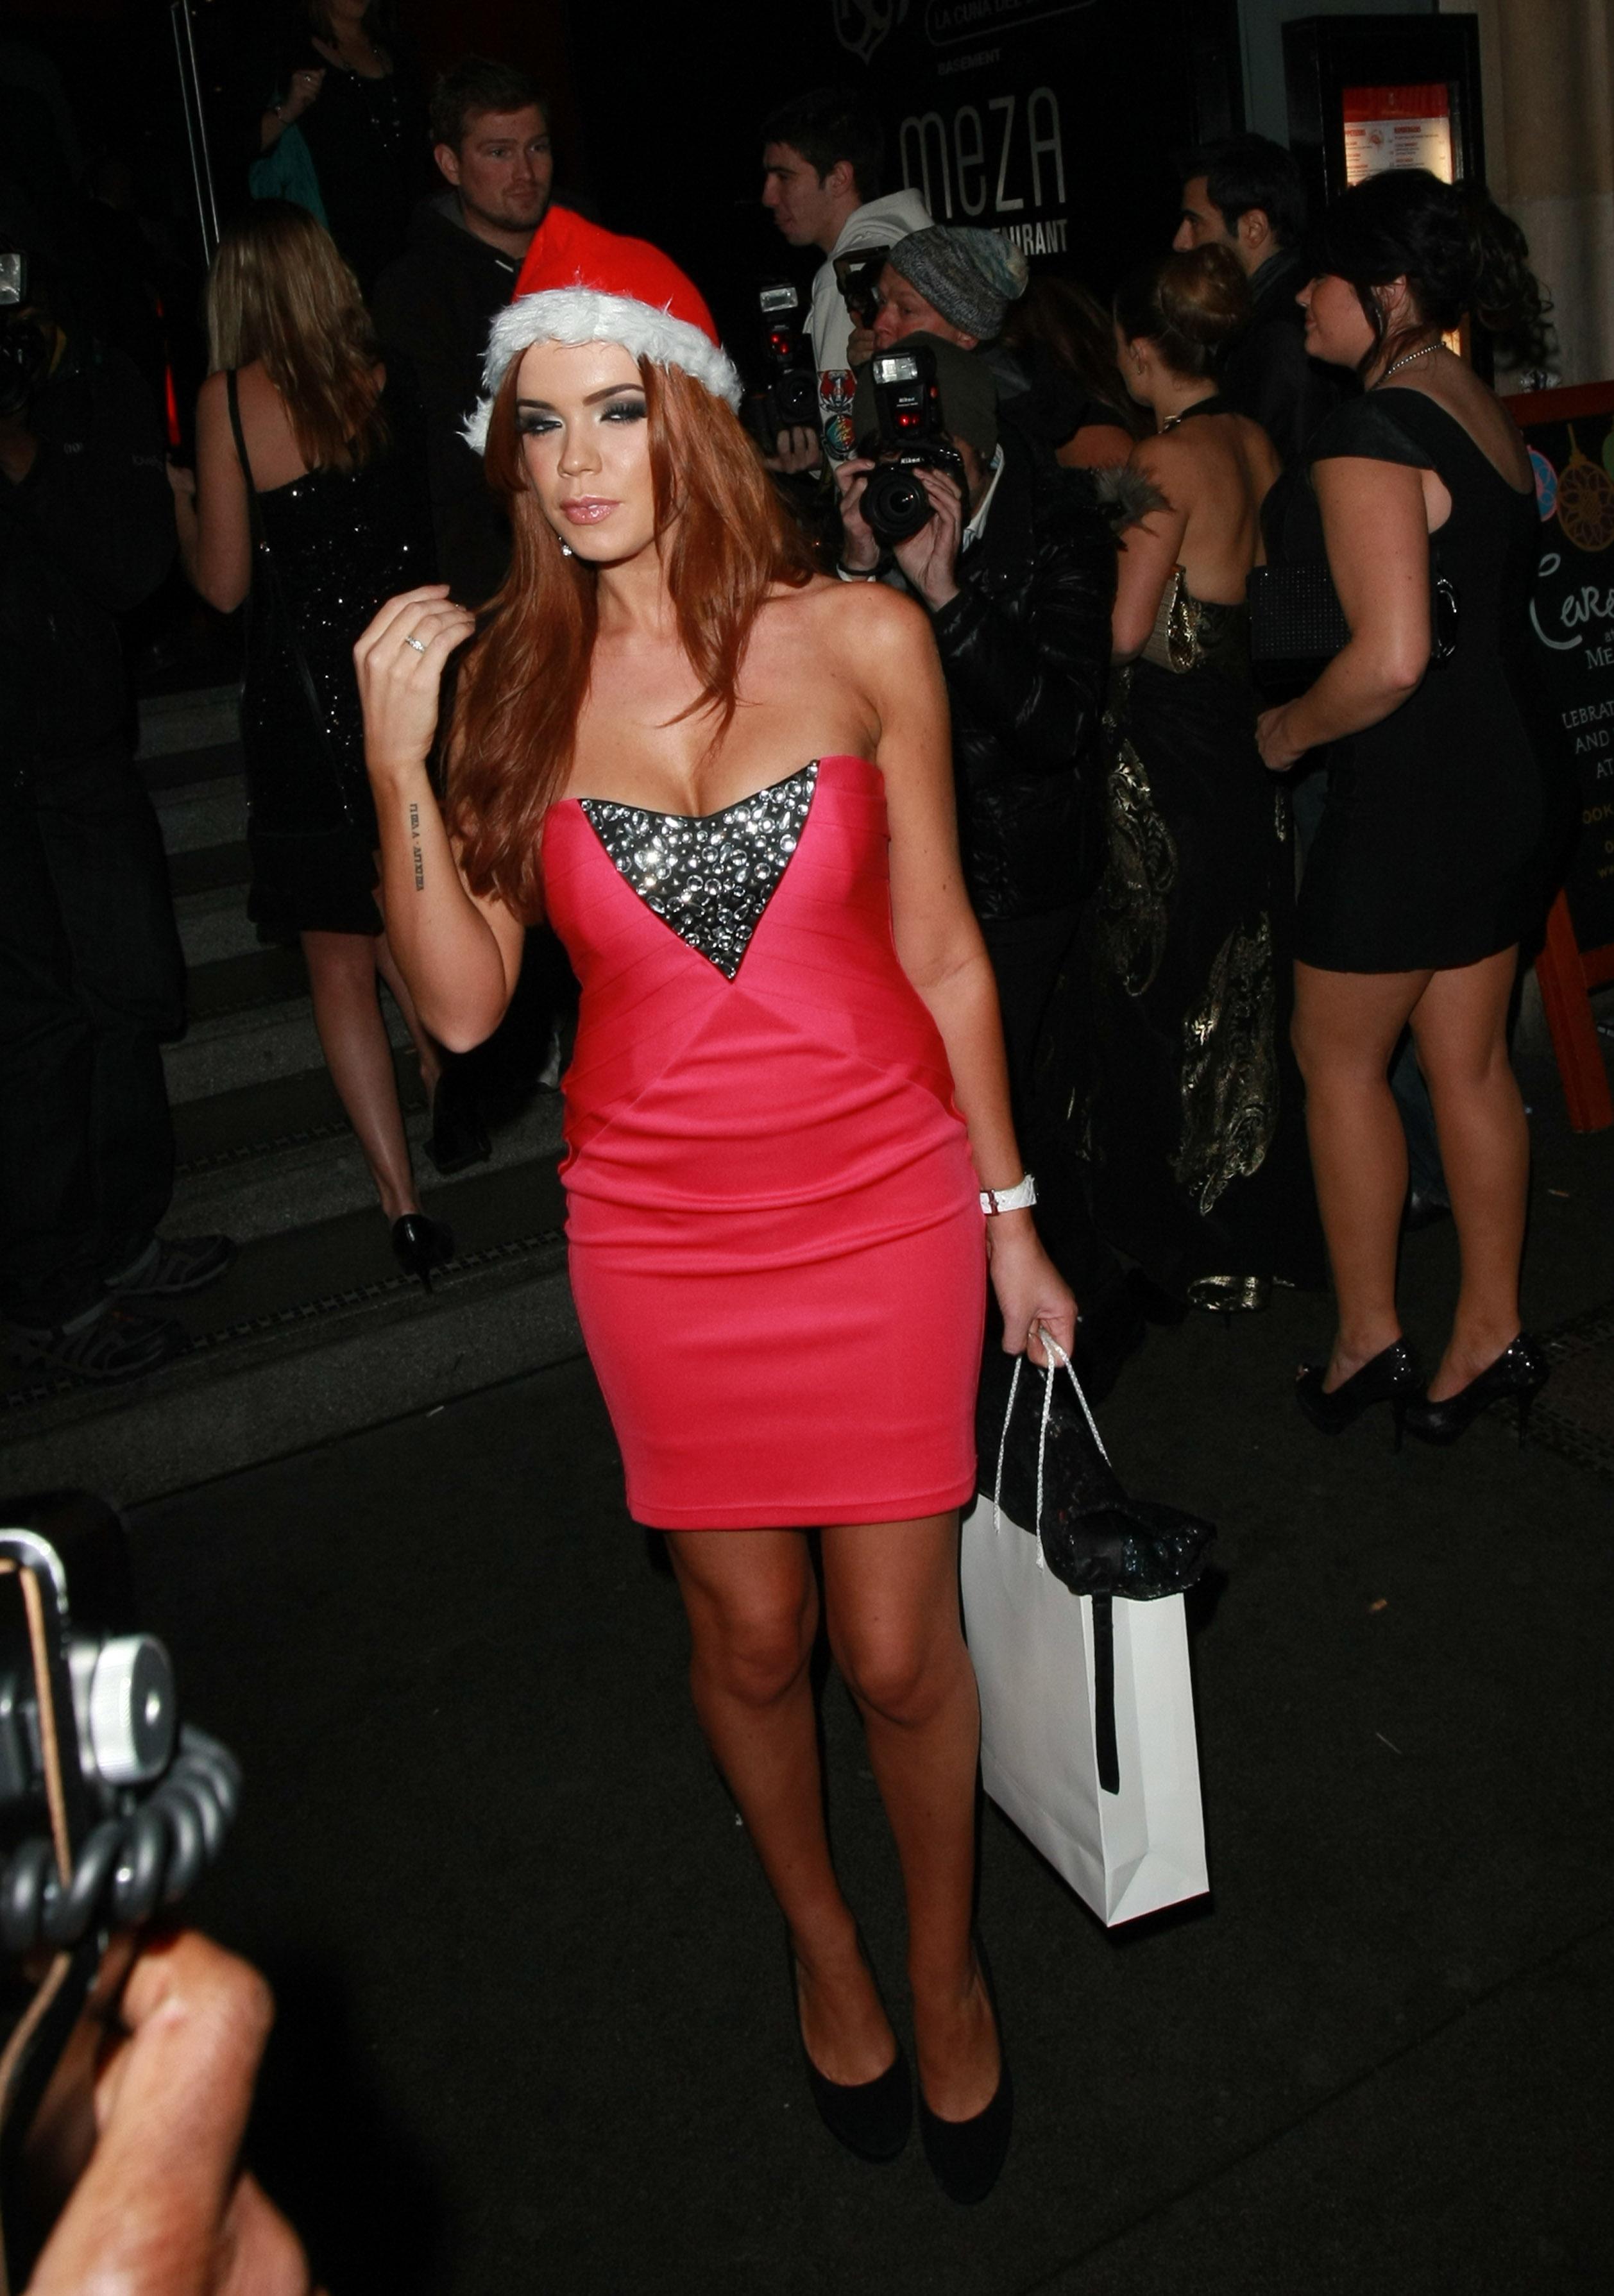 Maria Fowler No Source Celebrity Posing Hot Babe Celebrity